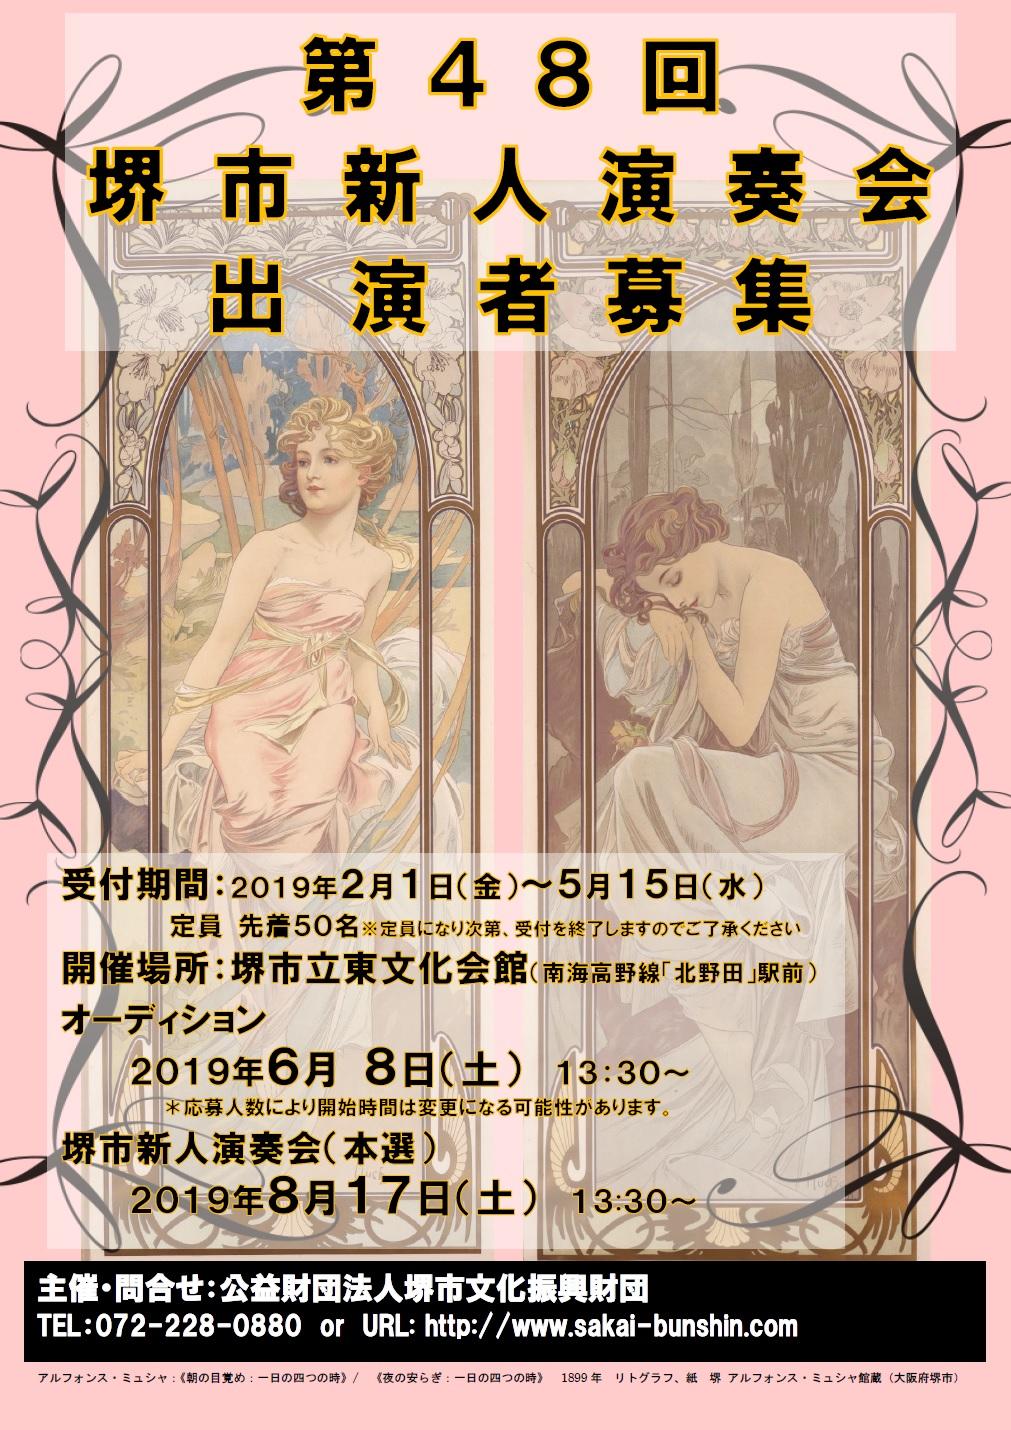 第48回堺市新人演奏会 出演者オーディション参加者募集